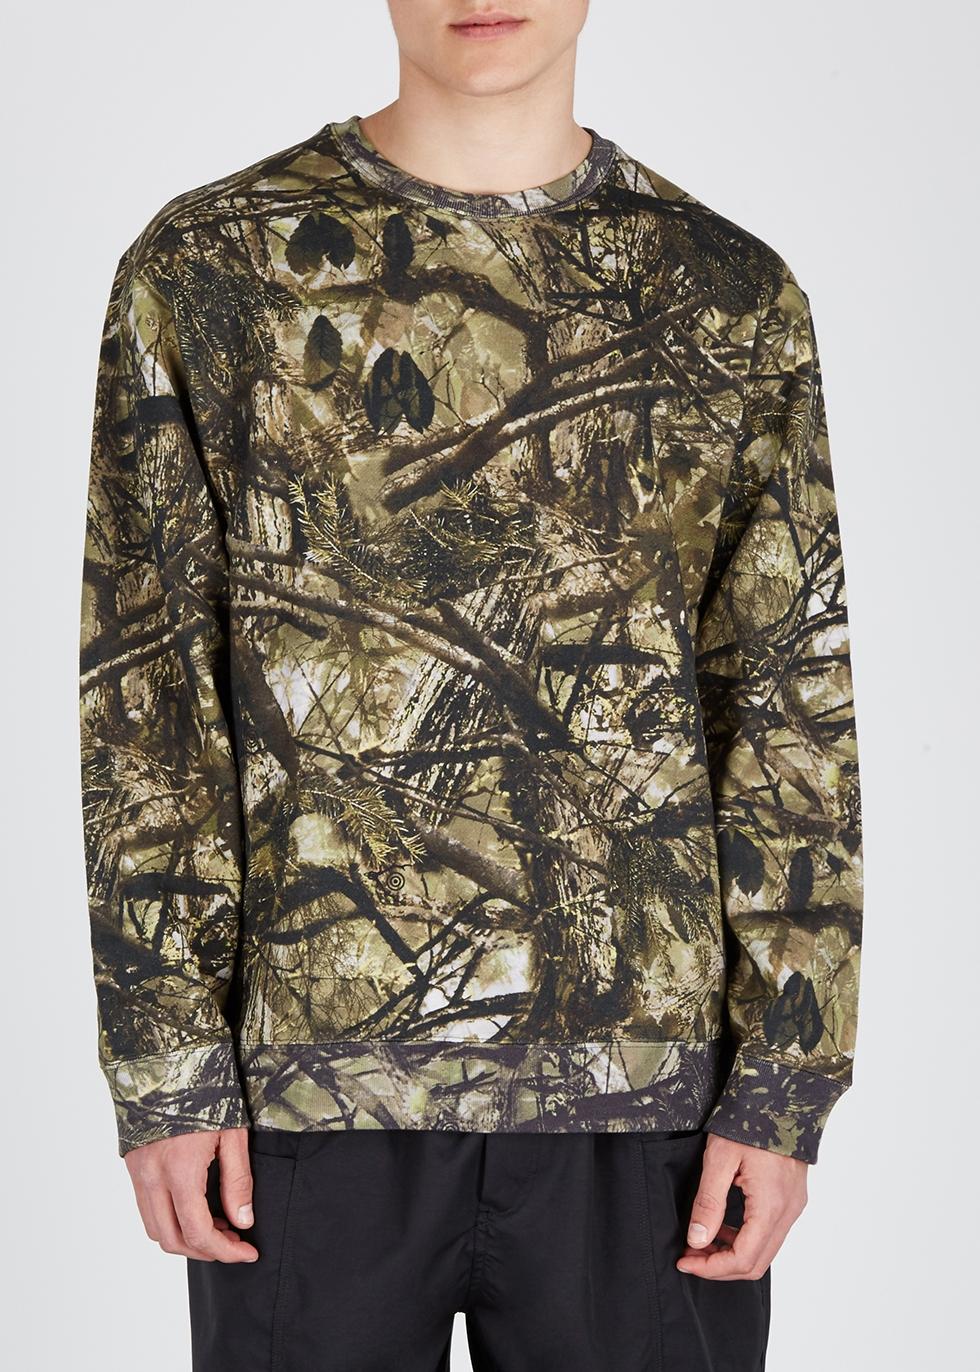 Printed cotton sweatshirt - South2 West8